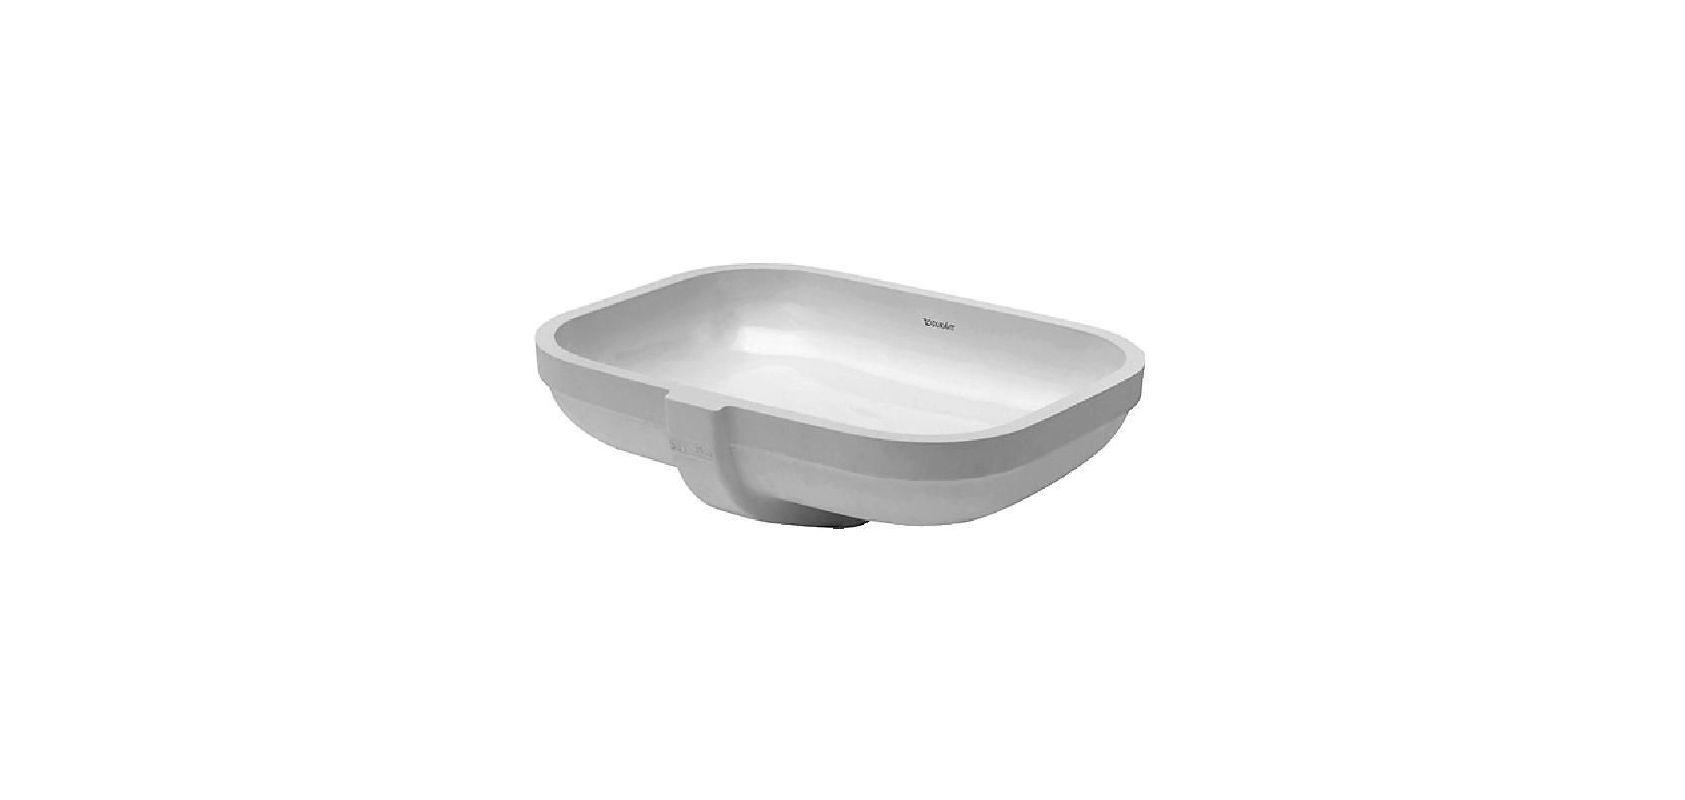 Duravit 0457480000 White Undercounter Vanity Basin 18 7 8